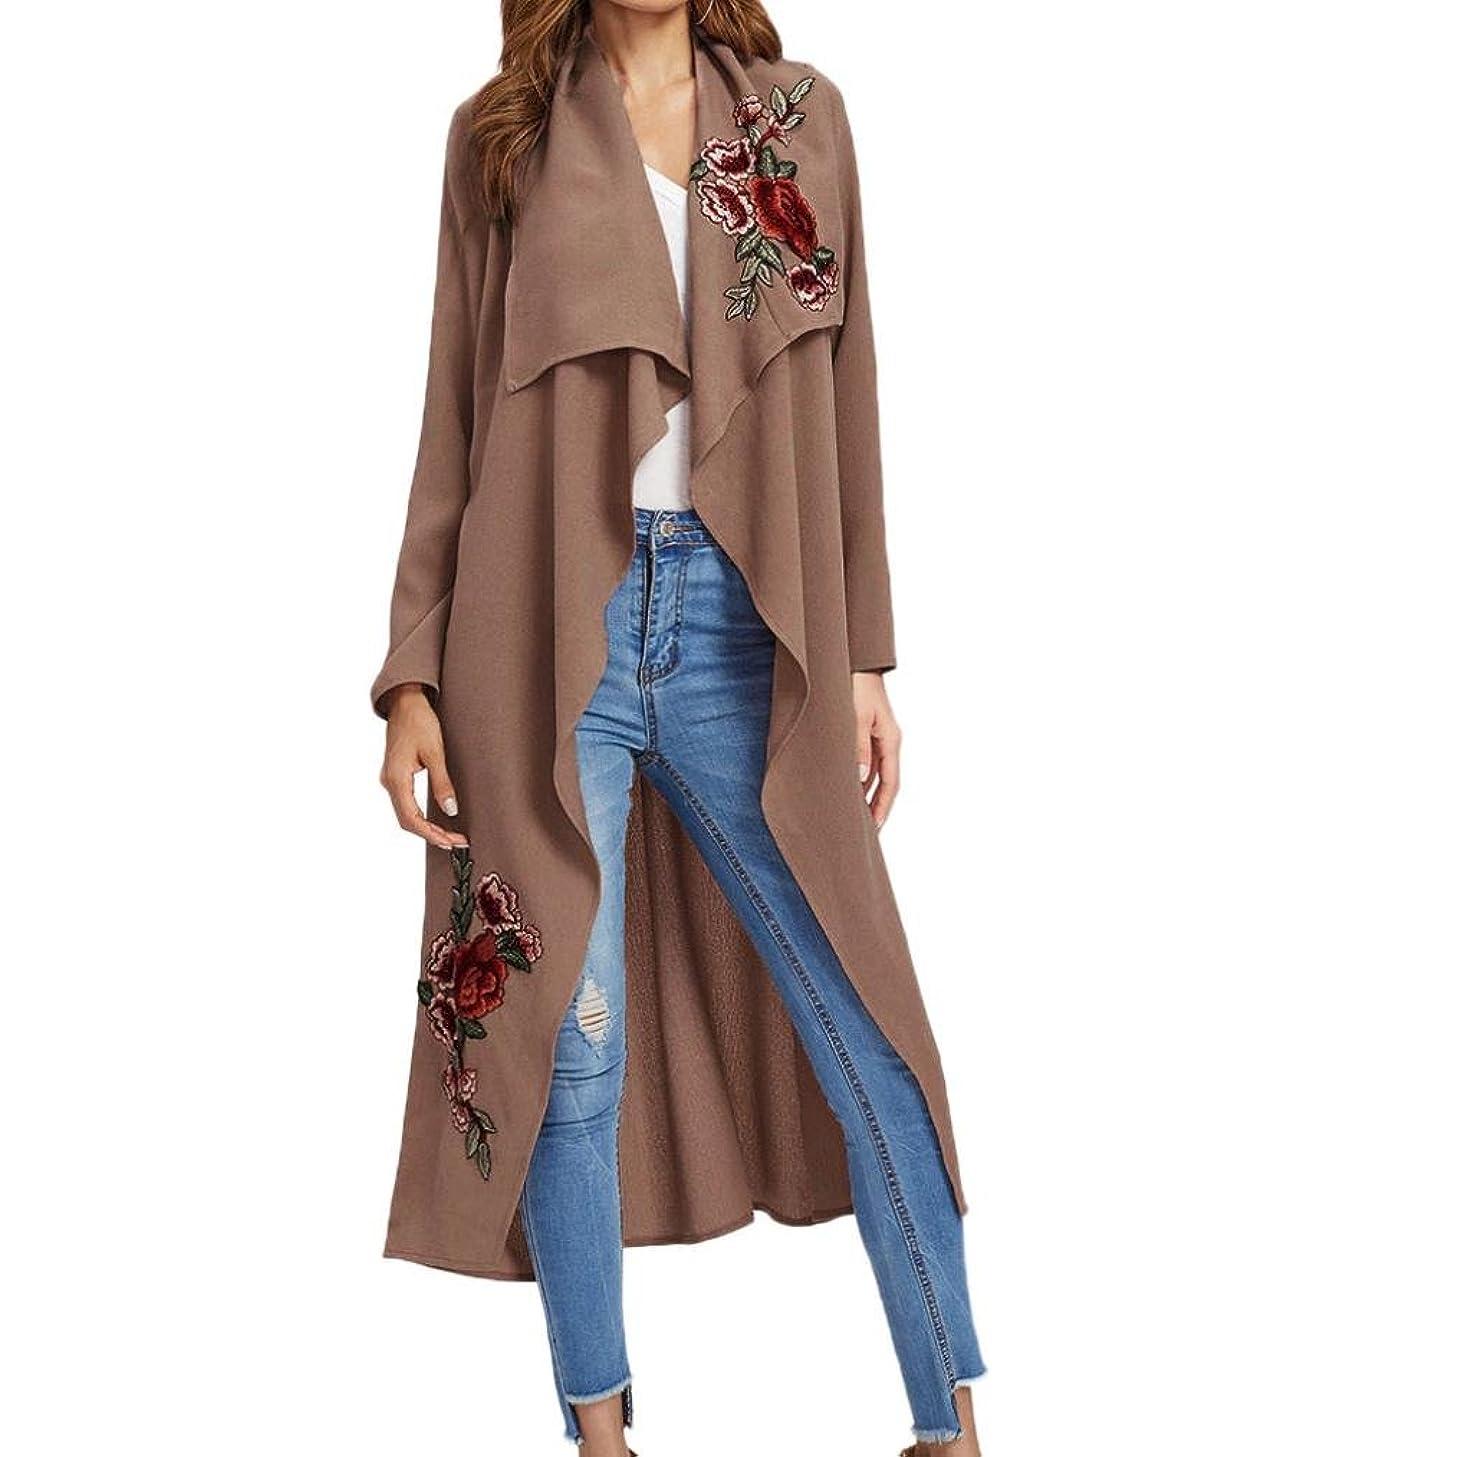 Hemlock Women Long Cardigan Coat, Women's Long Sleeve Shawl Kimono Top Cover up Outwear Jacket (S, Brown)